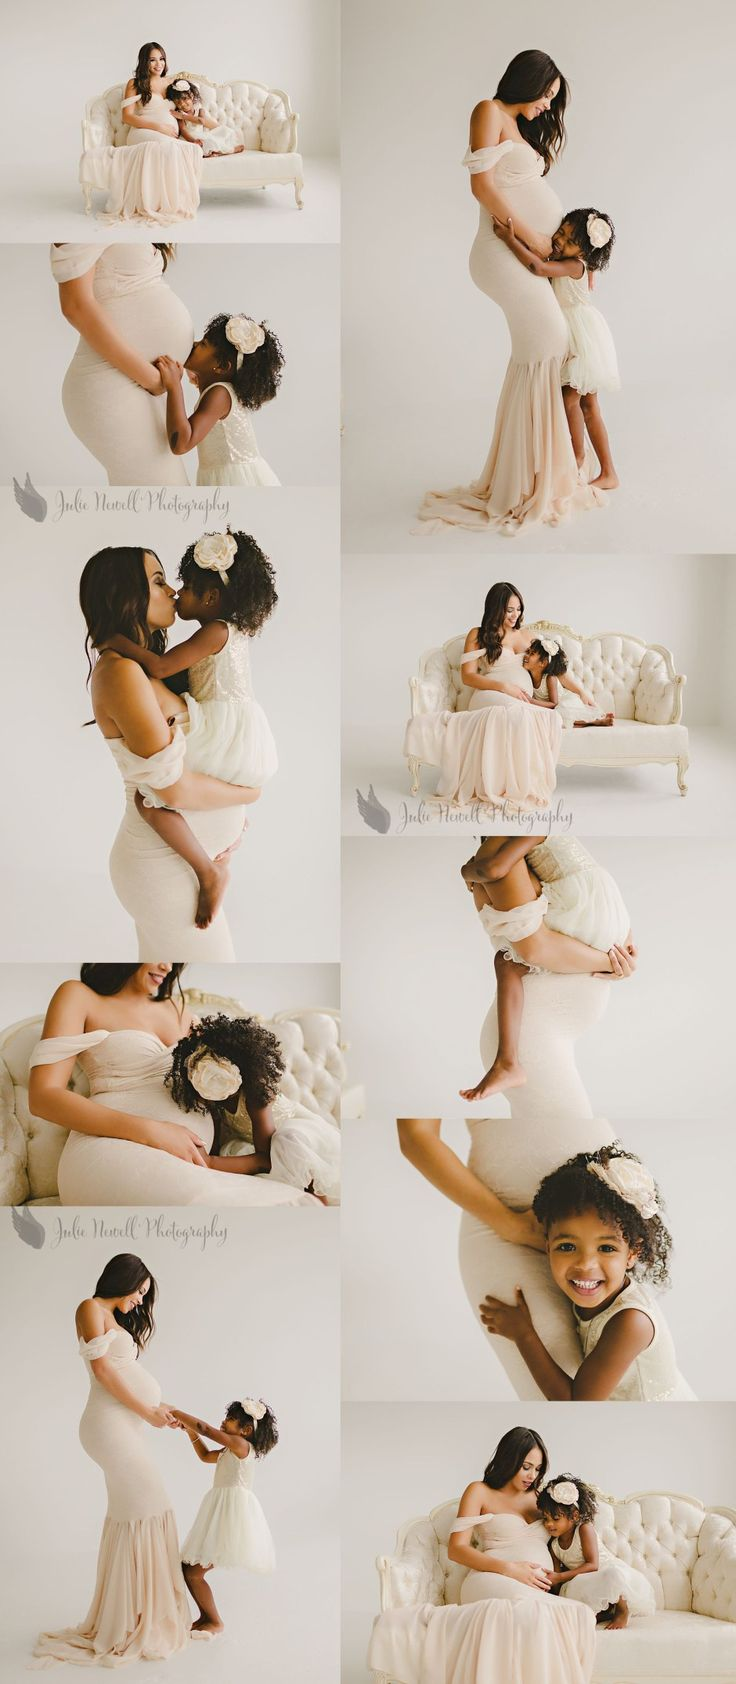 maternity photographer, maternity photography, best maternity photographer, best maternity photography, chicago maternity photographer, chicago maternity photography, in studio maternity photographer, in studio maternity photography